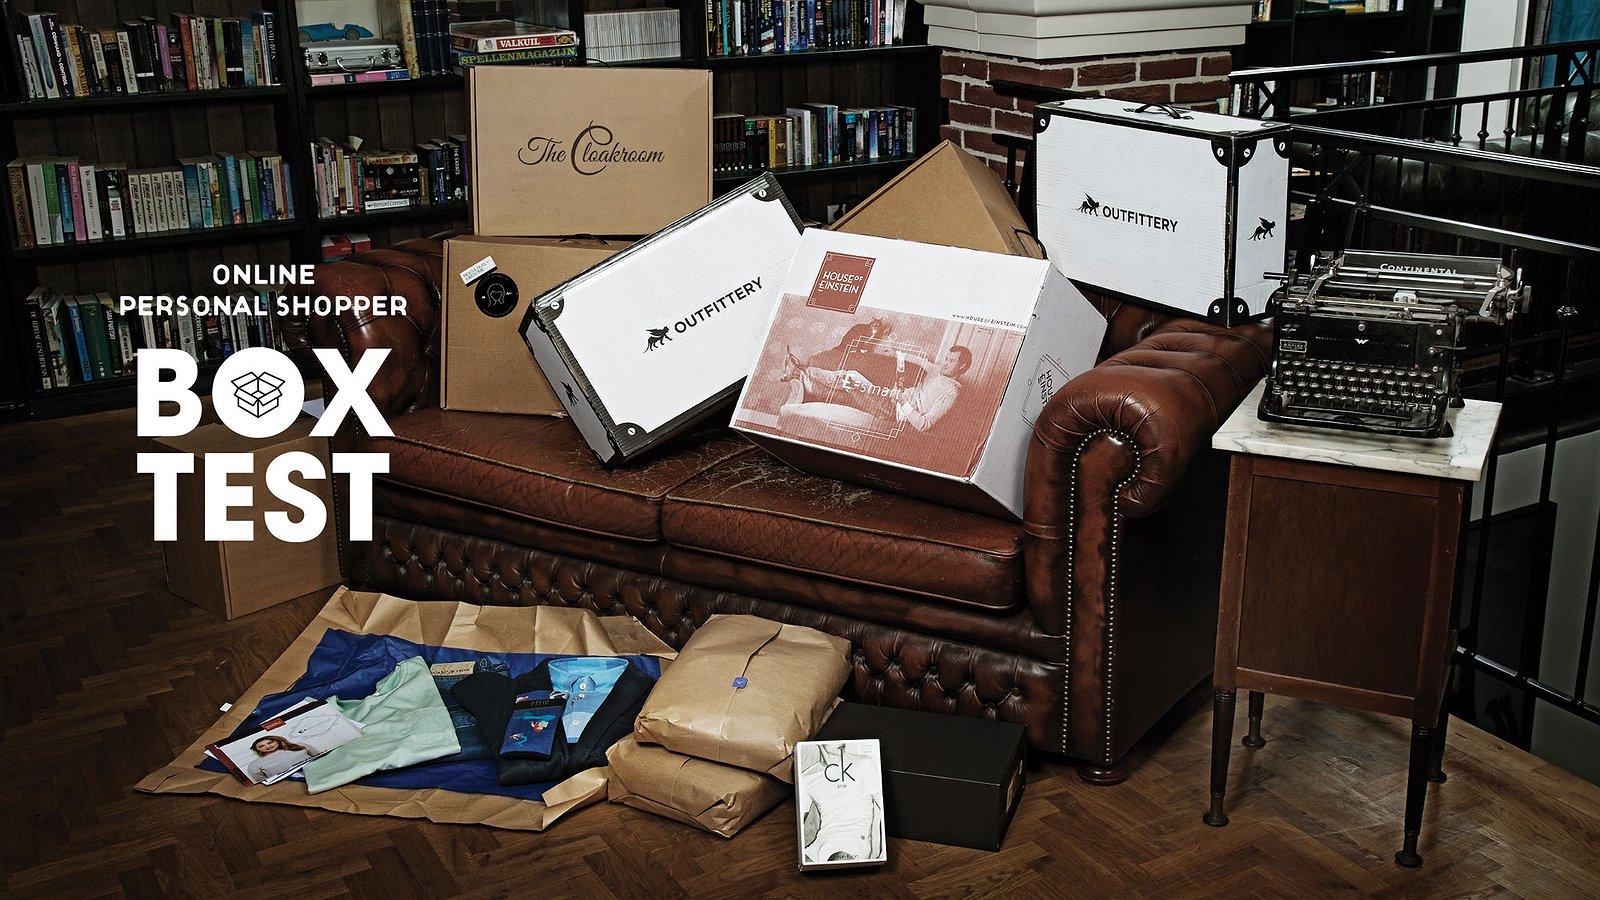 Online Personal Shopper: Kledingbox Test